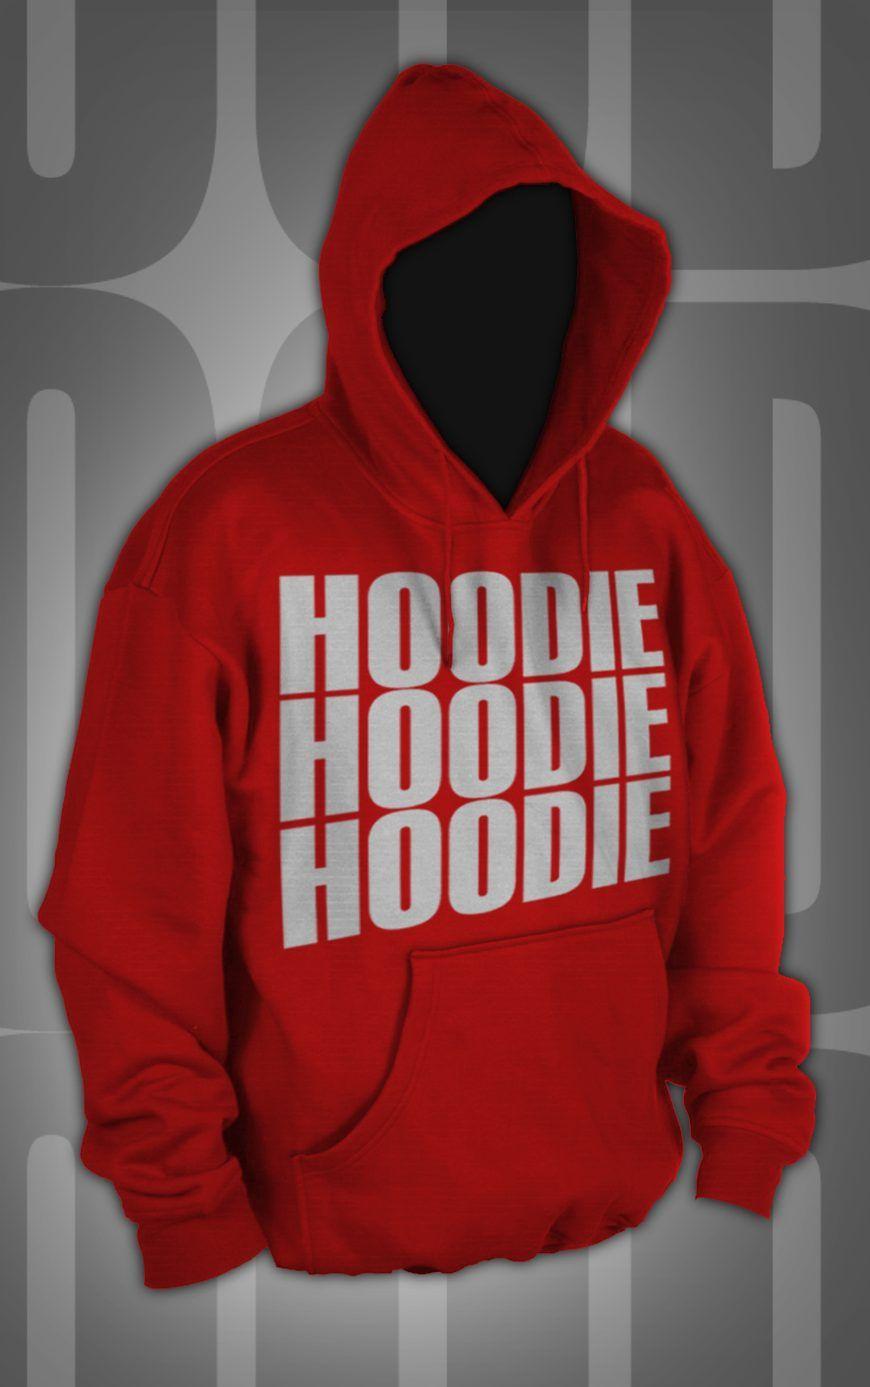 Free No Zipper Hoodie Mockup PSD | New | Pinterest